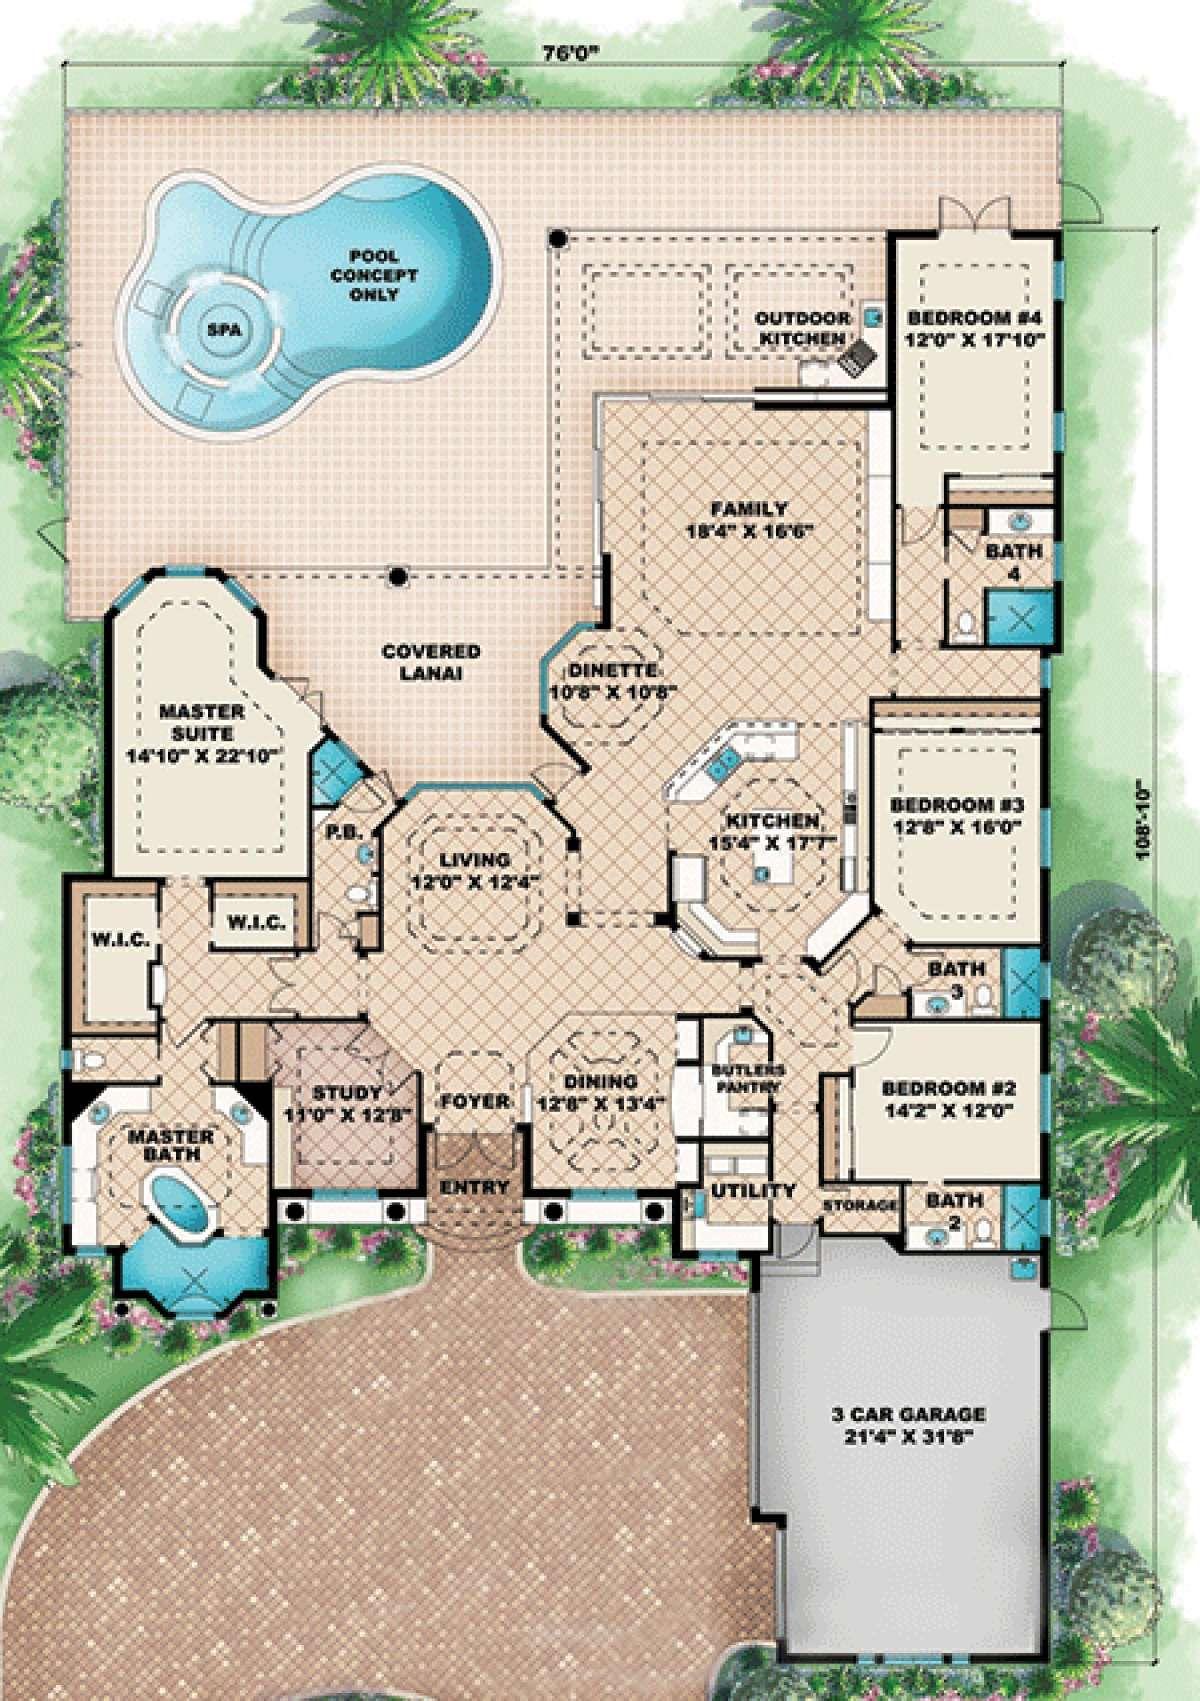 House Plan 1018 00110 Florida Plan 3 985 Square Feet 4 Bedrooms 5 Bathrooms Mediterranean Style House Plans Dream House Plans House Plans